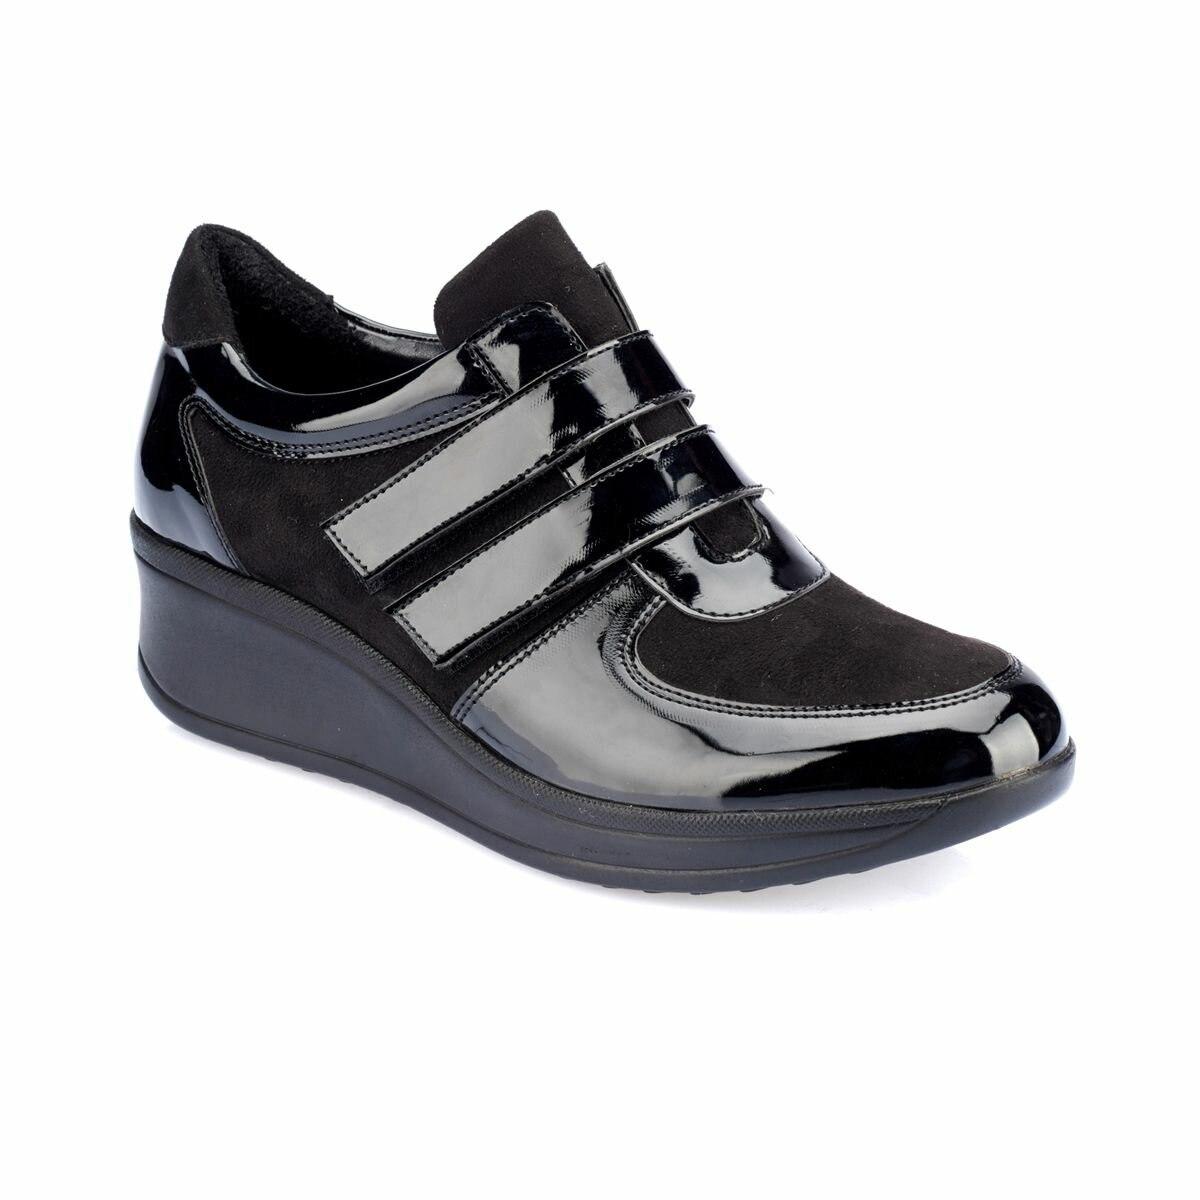 FLO TRV8211 Black Women Shoes Polaris